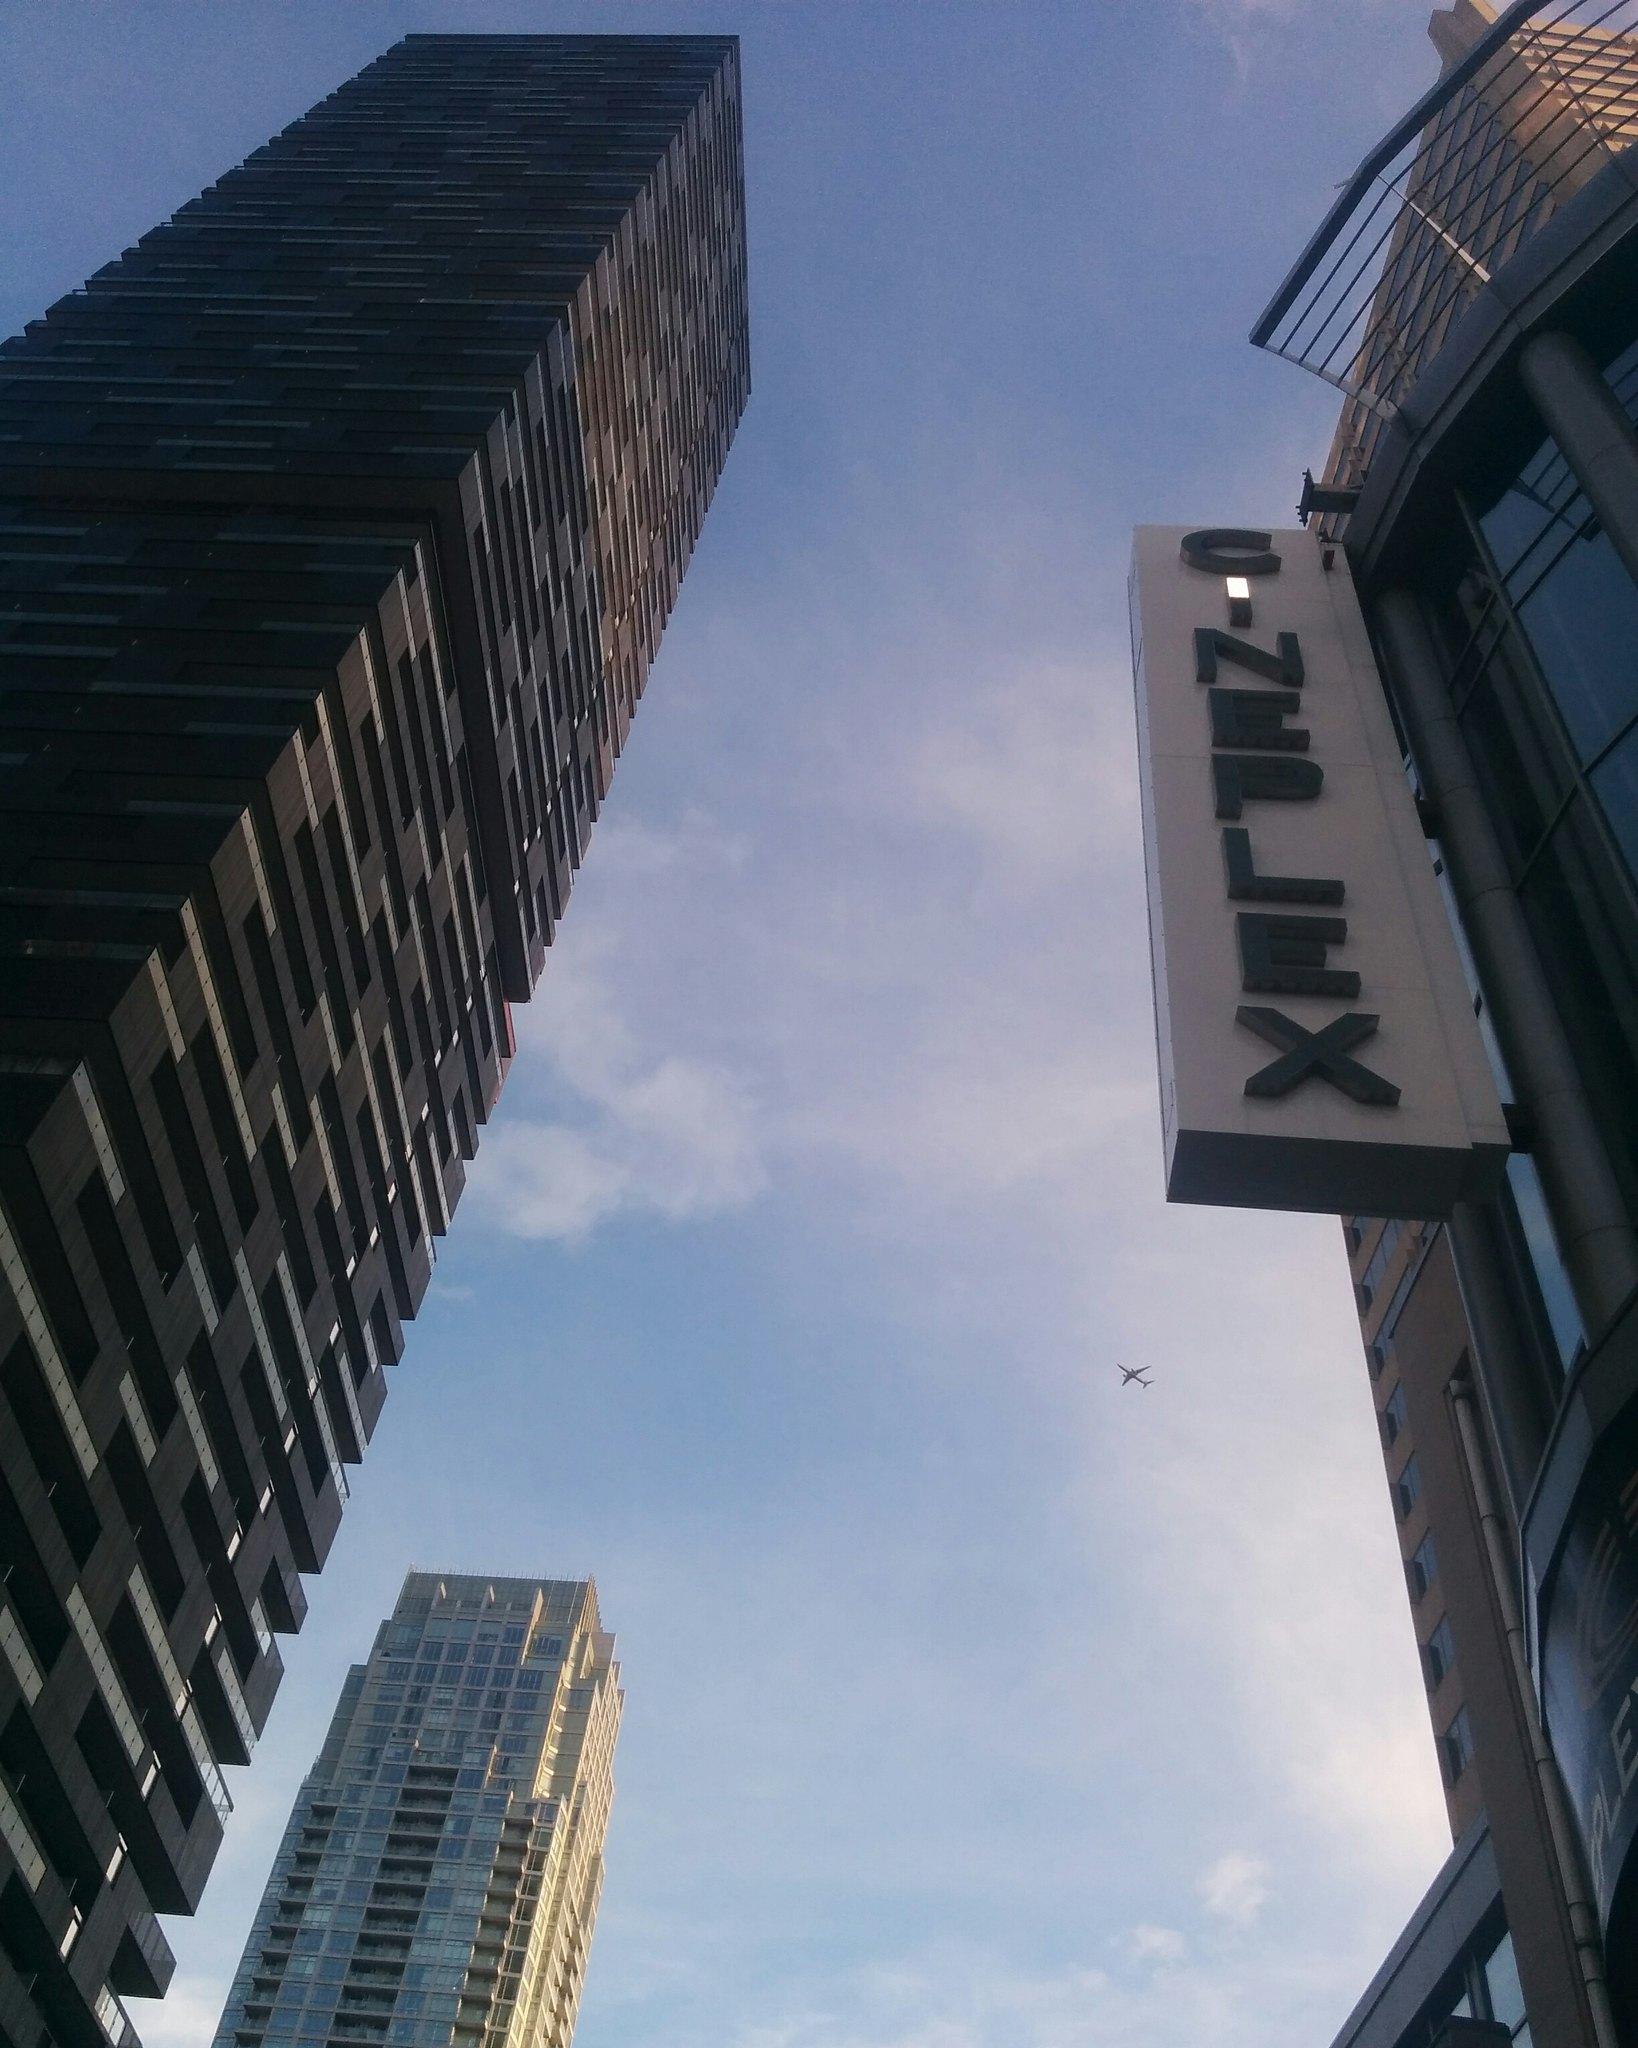 A slice of blue evening sky south down Yonge #toronto #yongeandeglinton #yongestreet #blue #sky #evening